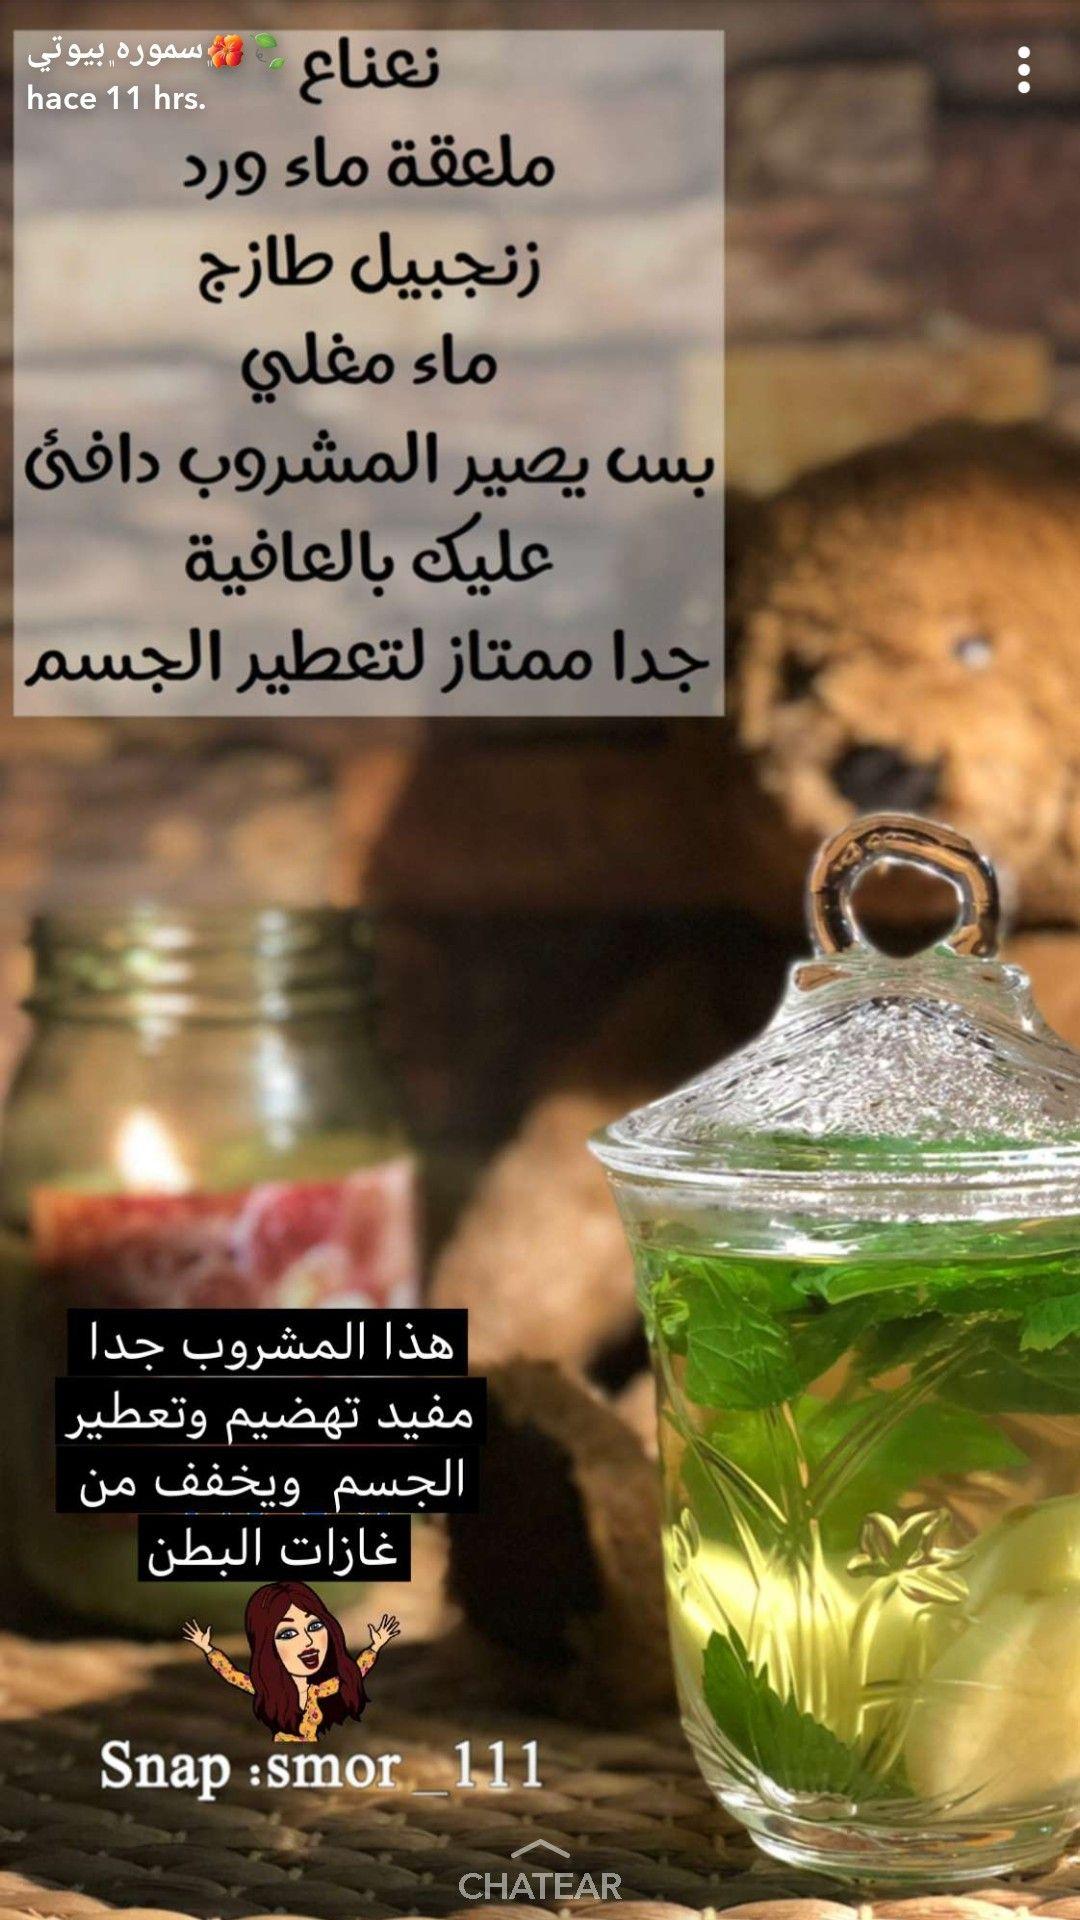 ماء ورد جنزبيل ماء ملغي Rose Water Ginger Boiled Water Healthy Drinks Smoothies Detox Diet Drinks Healthy Juices